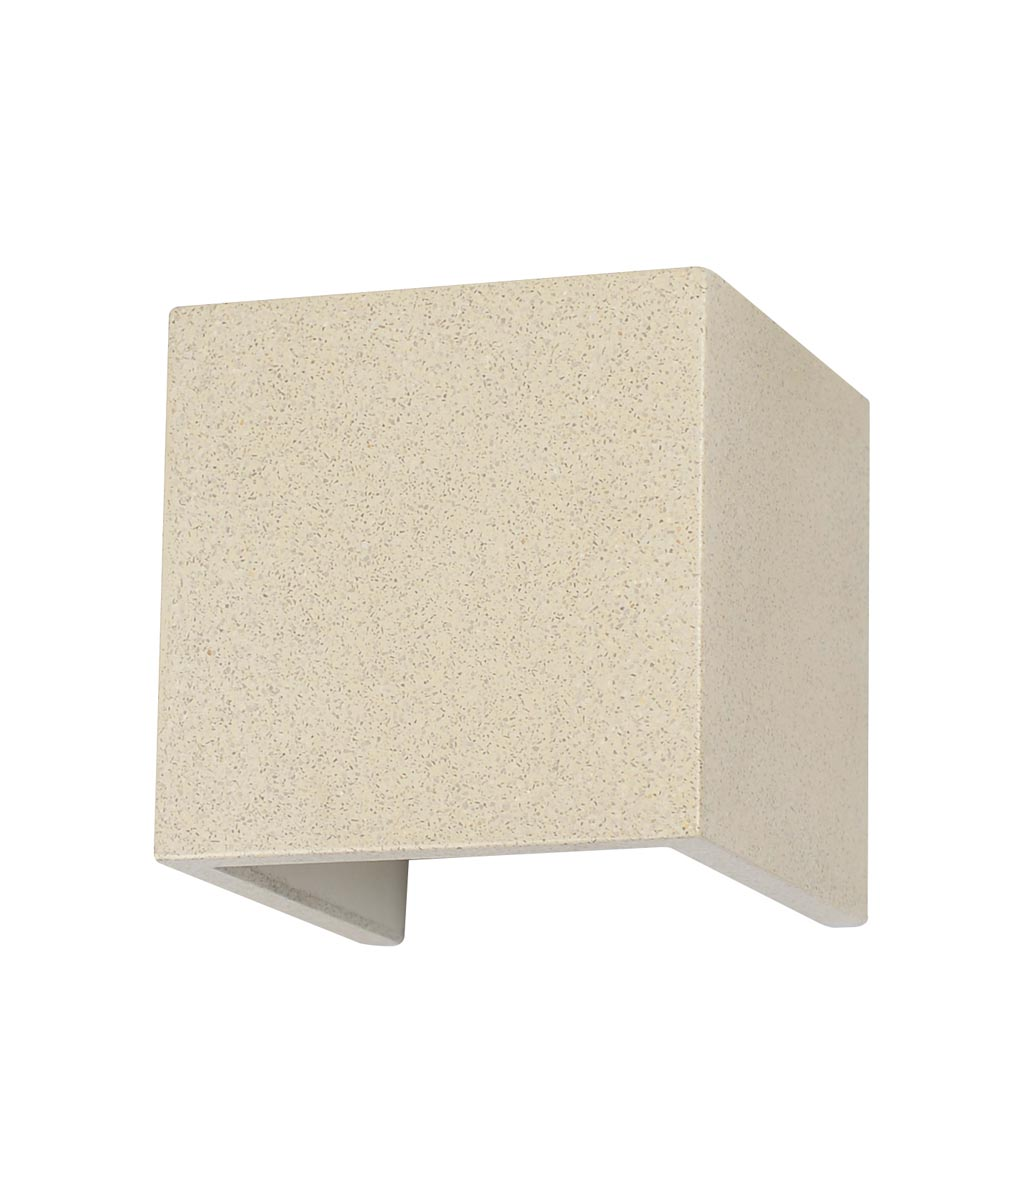 Aplique blanco 12W acabado cemento TAOS LED